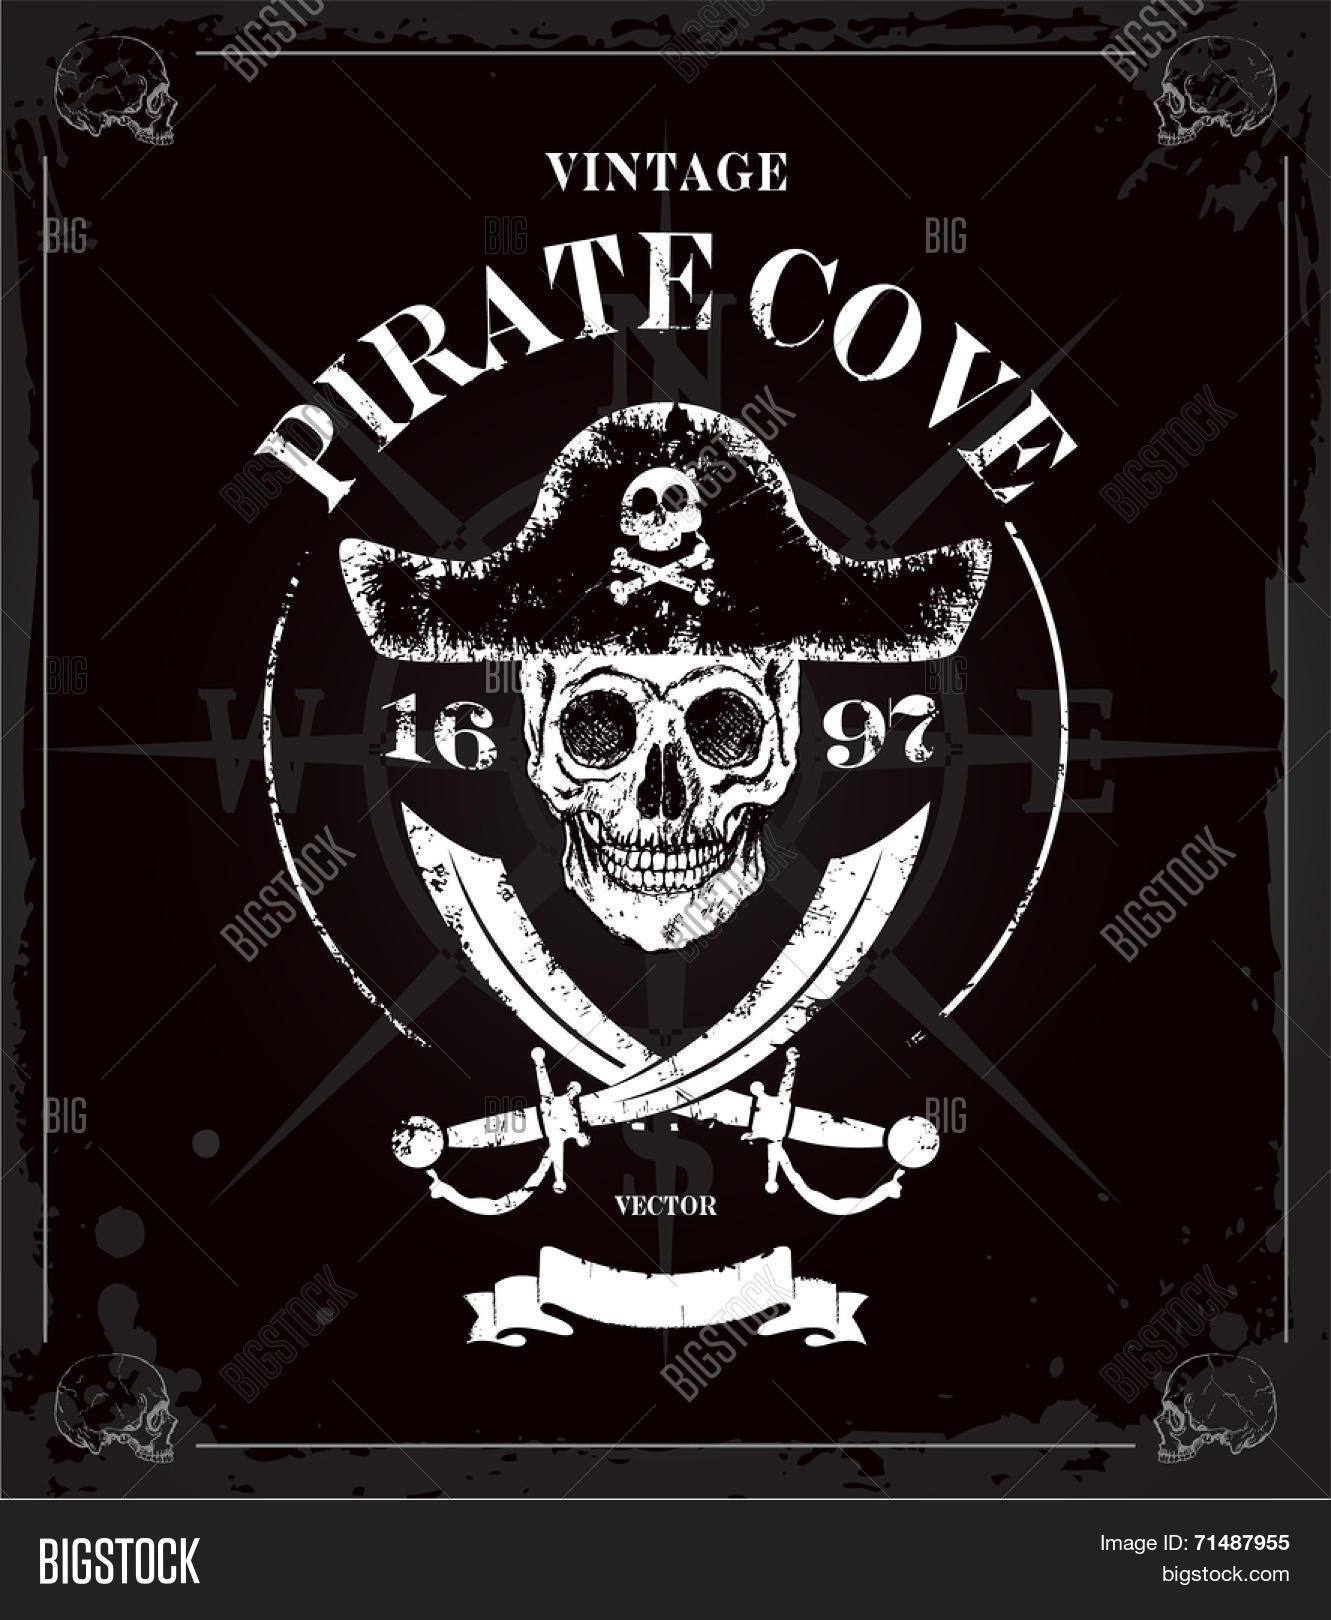 Vintage Vector Pirates Skull Frame Vector & Photo | Bigstock